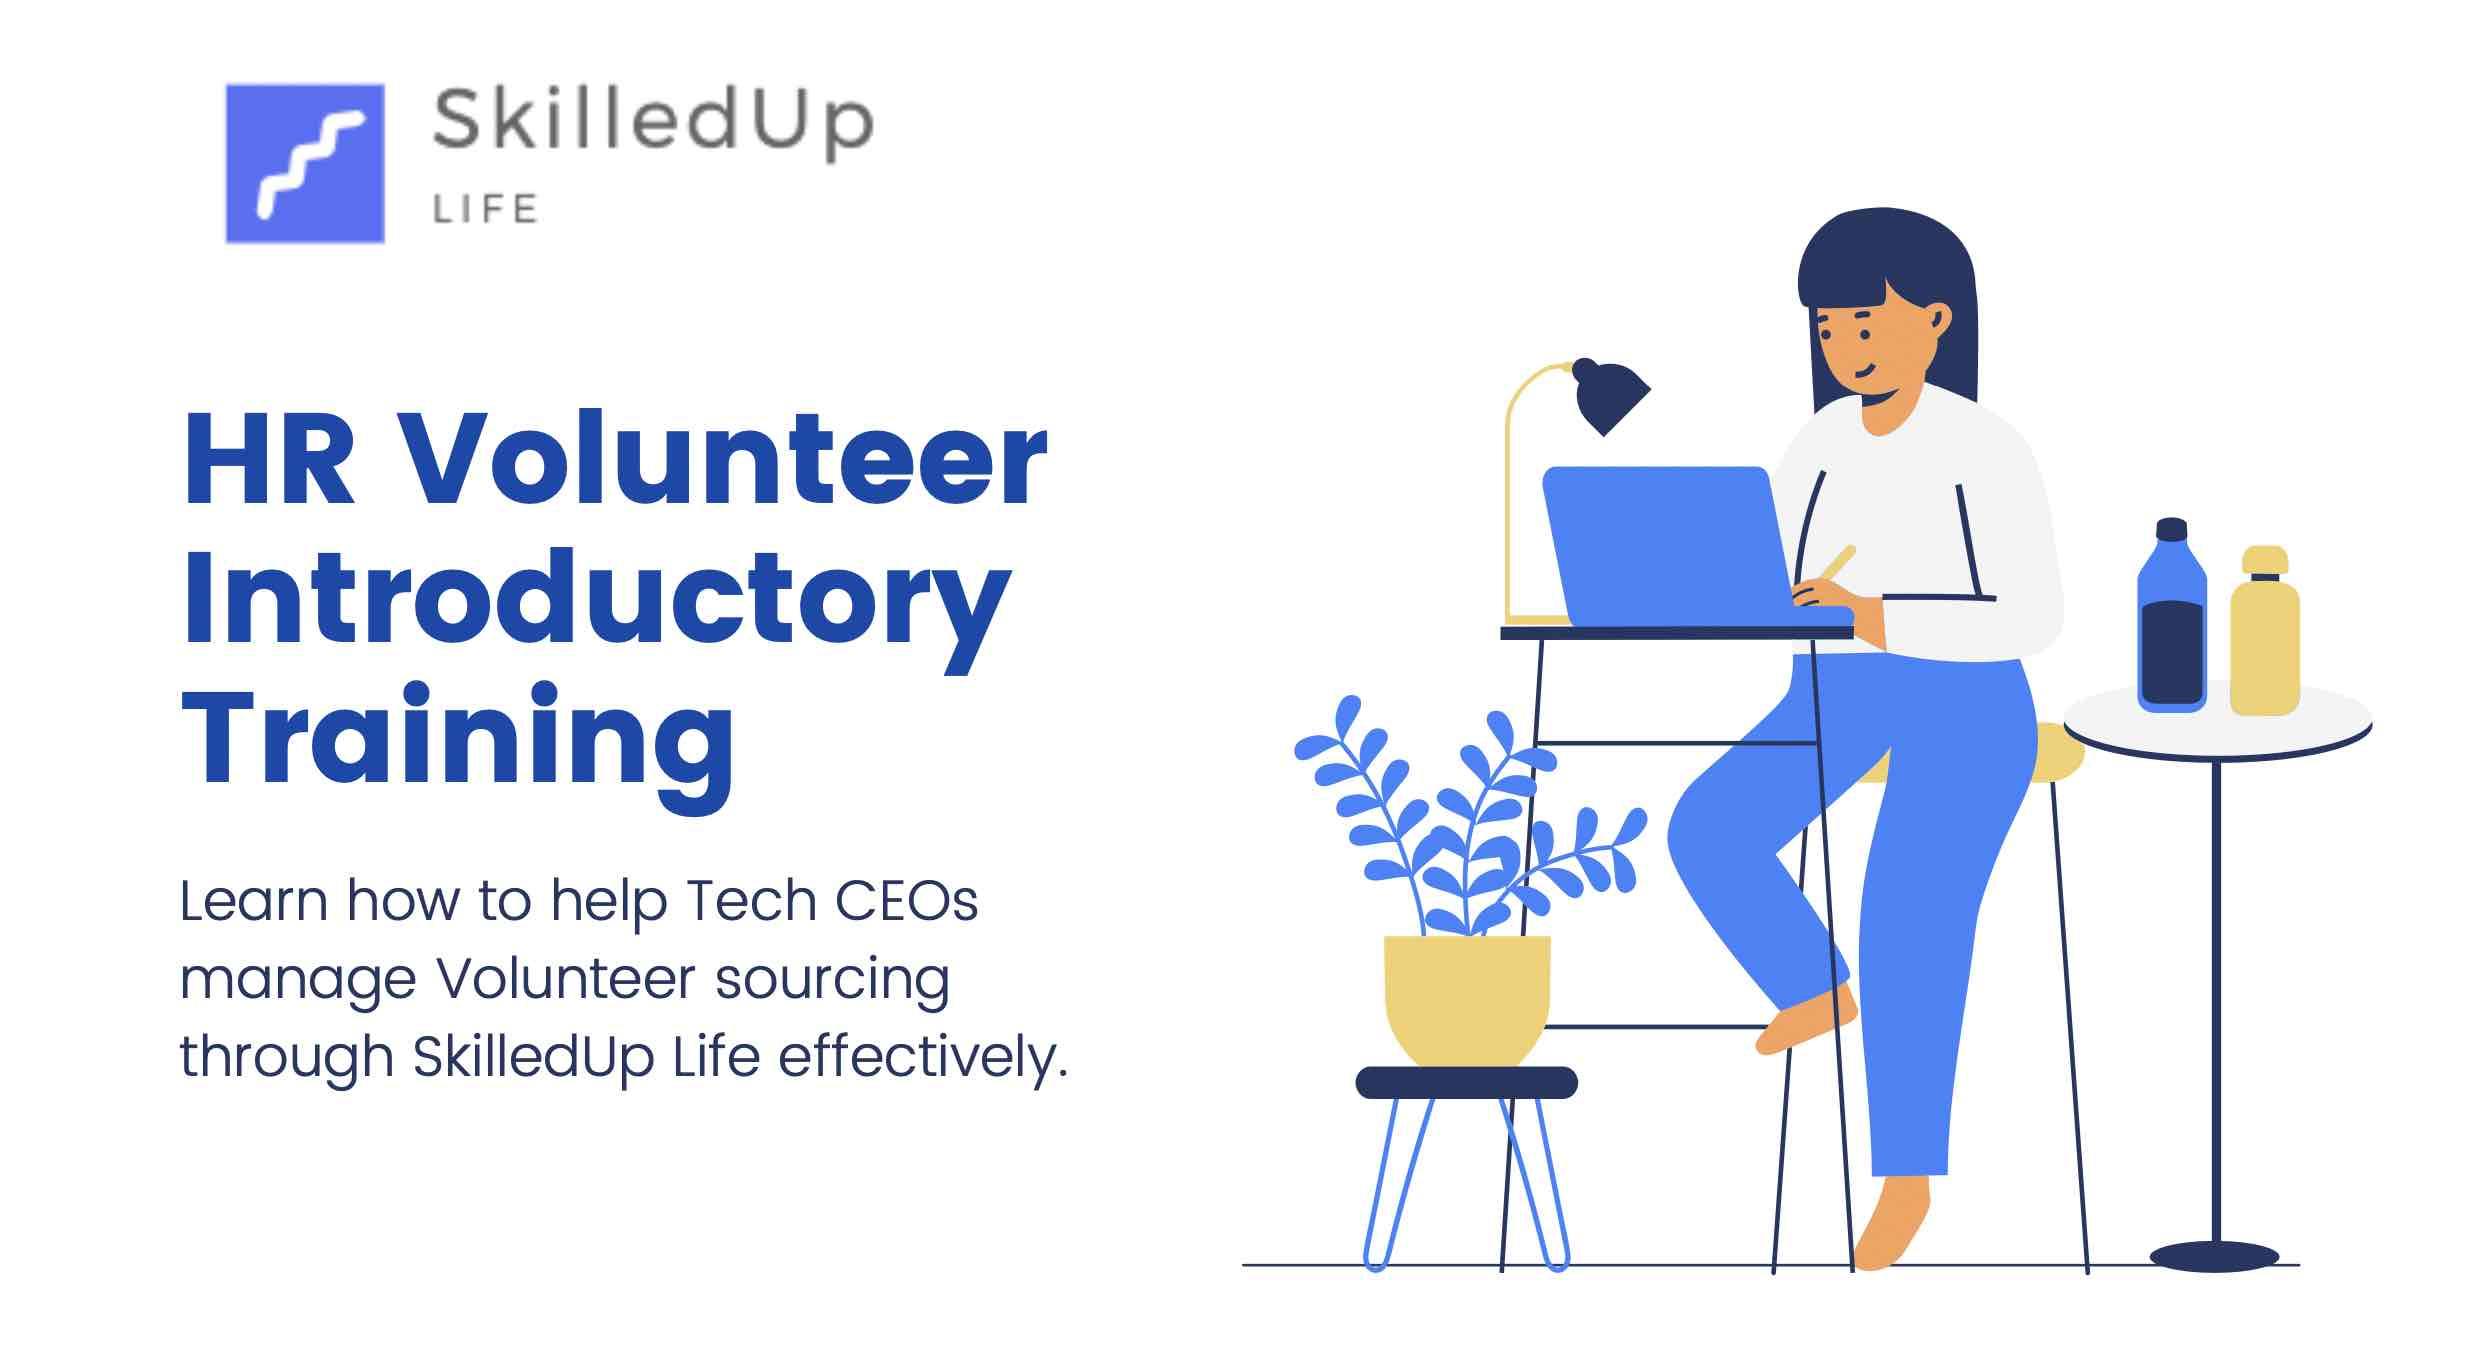 SkilledUp Life HR Volunteer Introductory Training